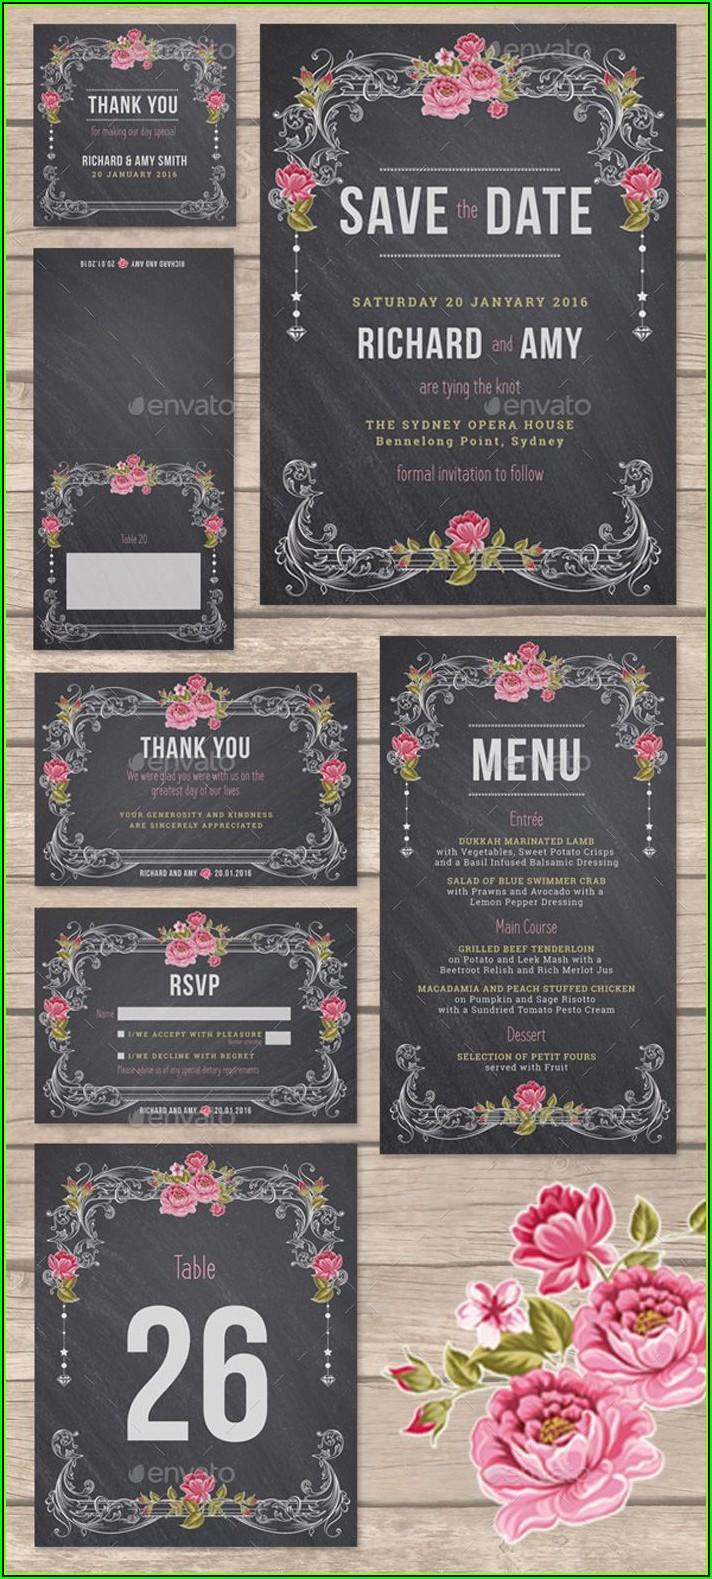 Chalkboard Wedding Invitation Templates